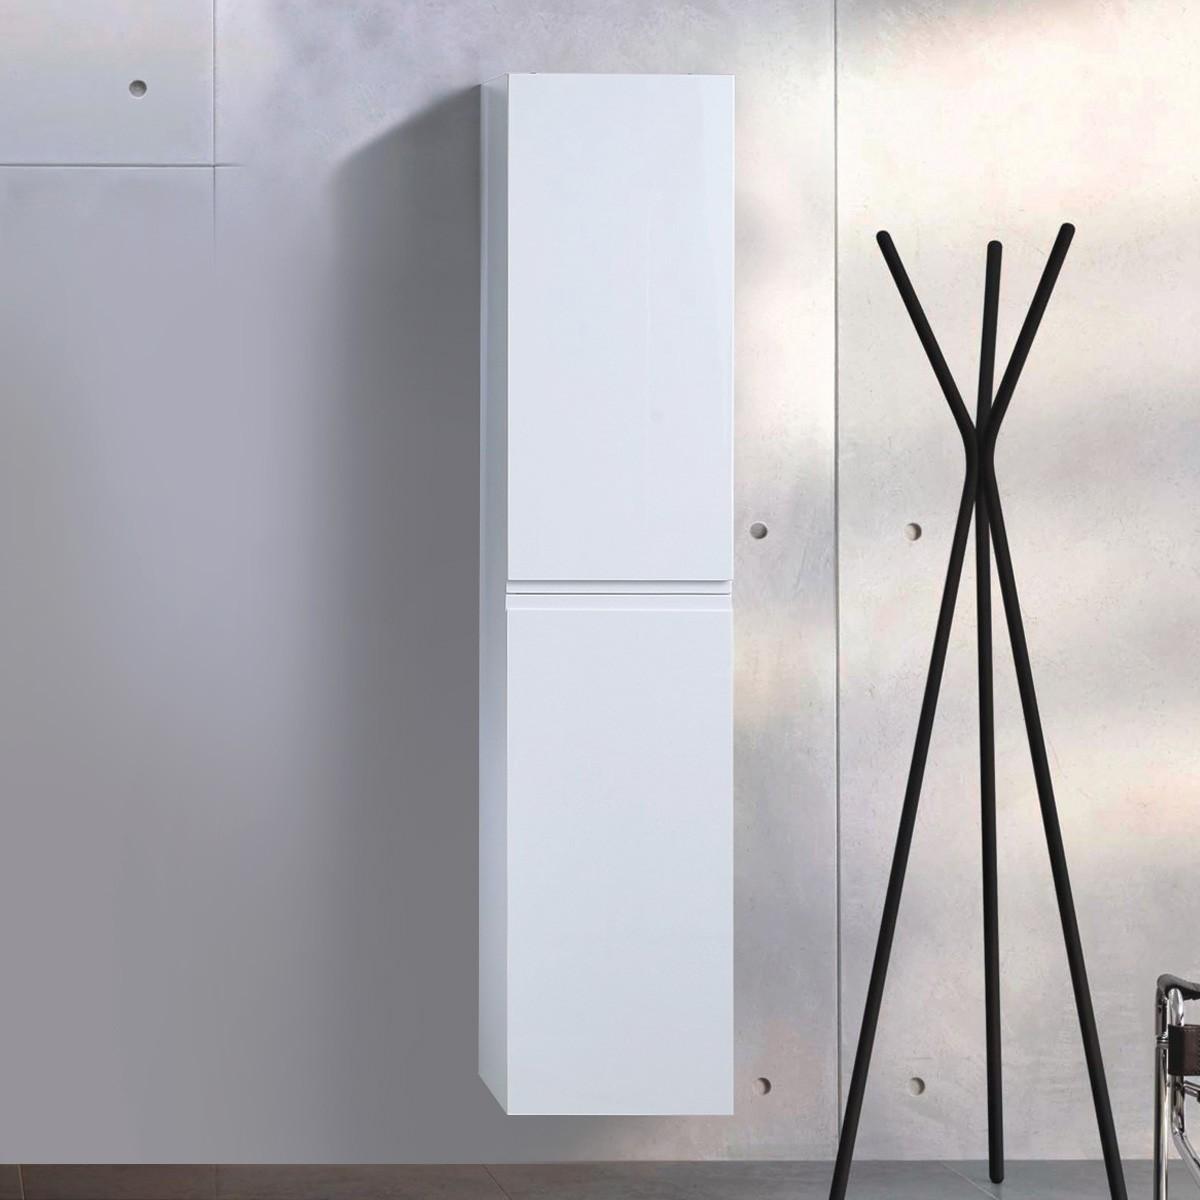 14 x 63 po Cabinet latéral suspendu au mur (ML1380-S)